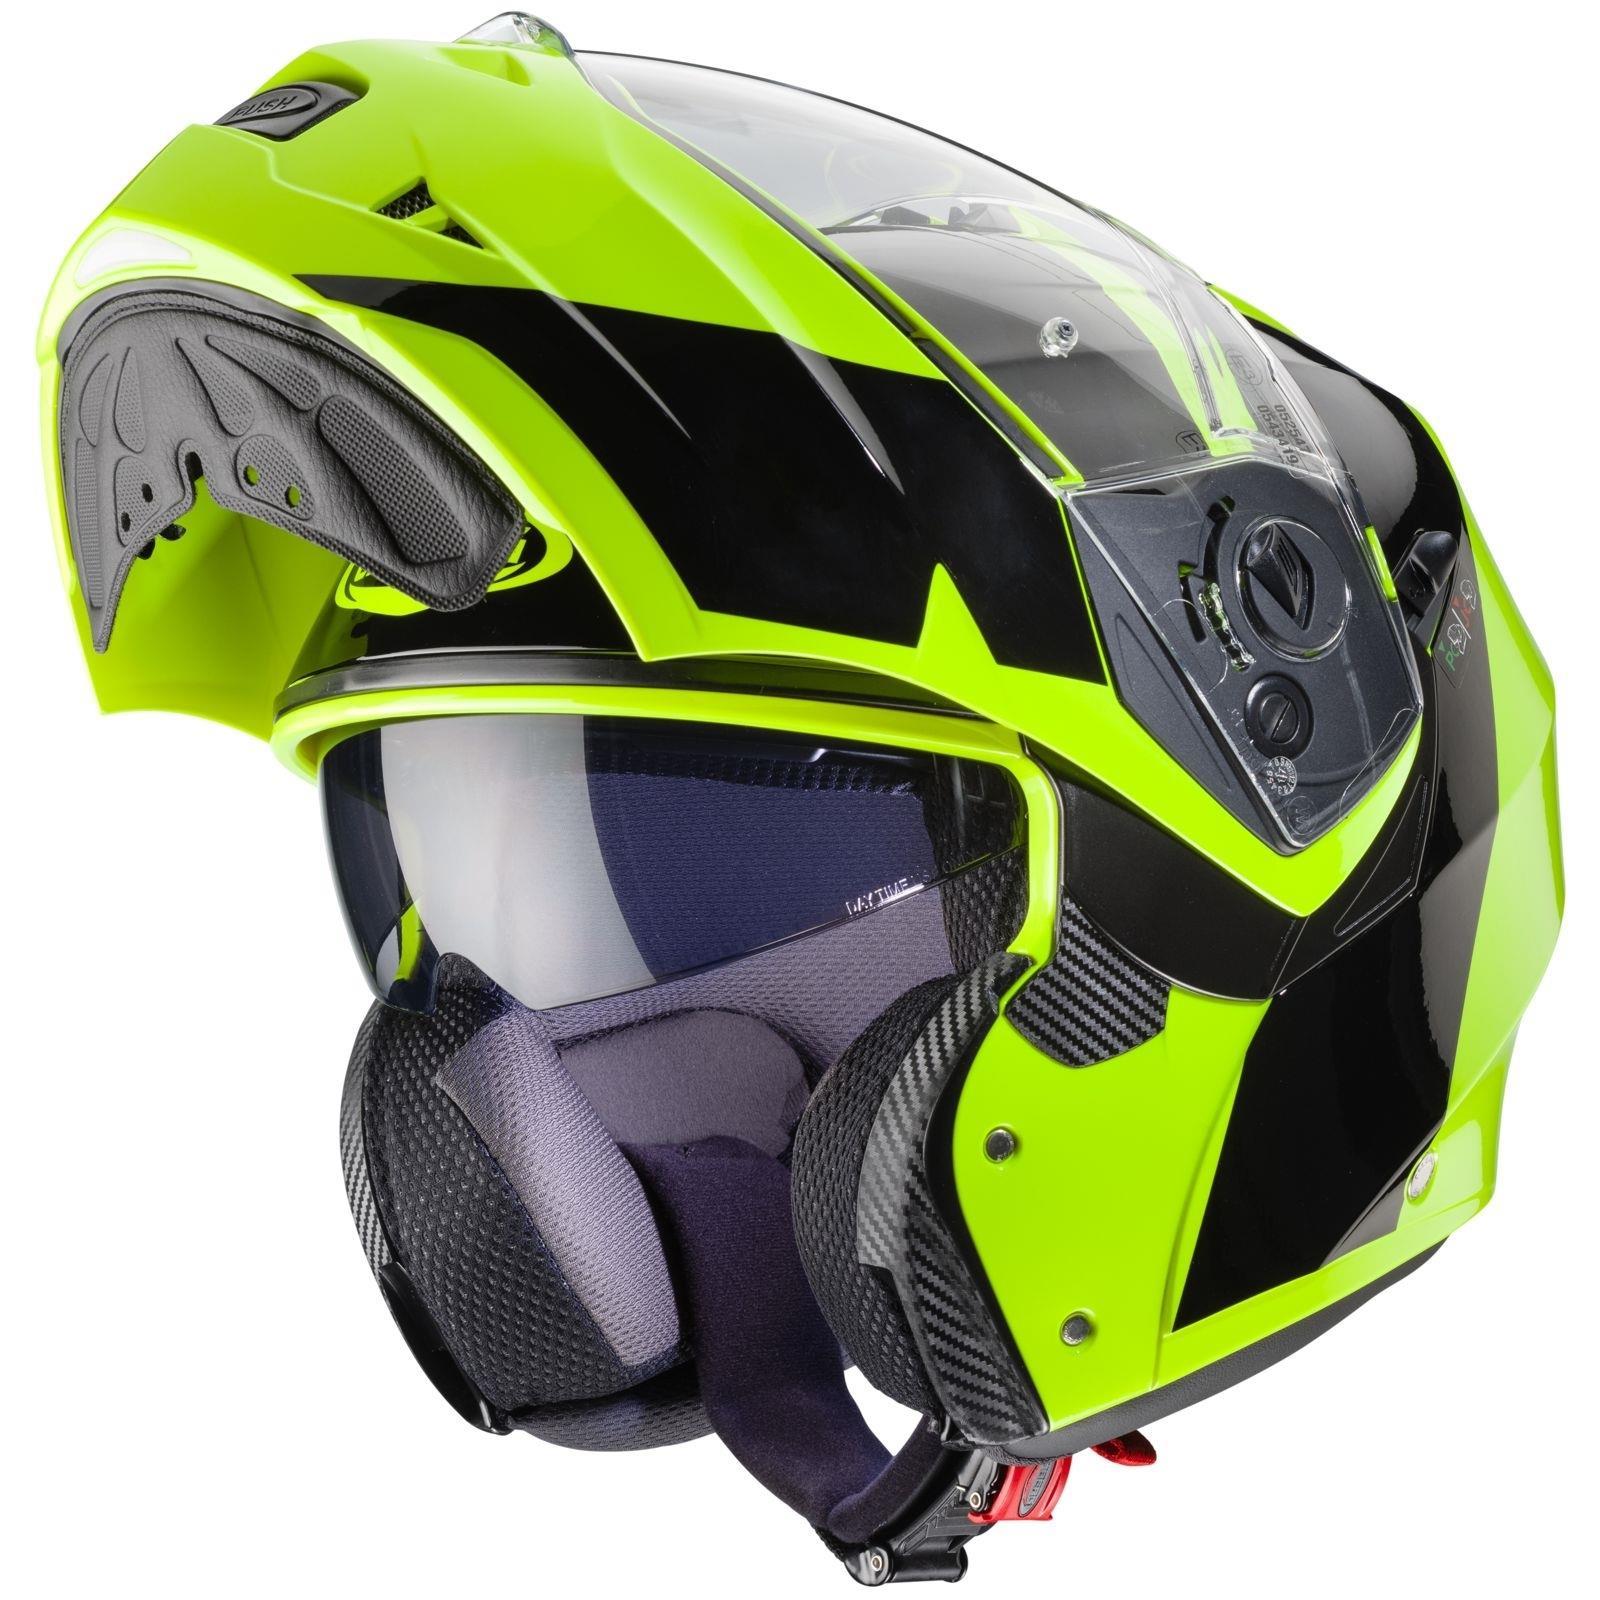 Caberg-Klapp-Helm-Duke-II-2-Motorrad-Belueftet-Sonnenblende-Pinlock-Visier-Jet Indexbild 35